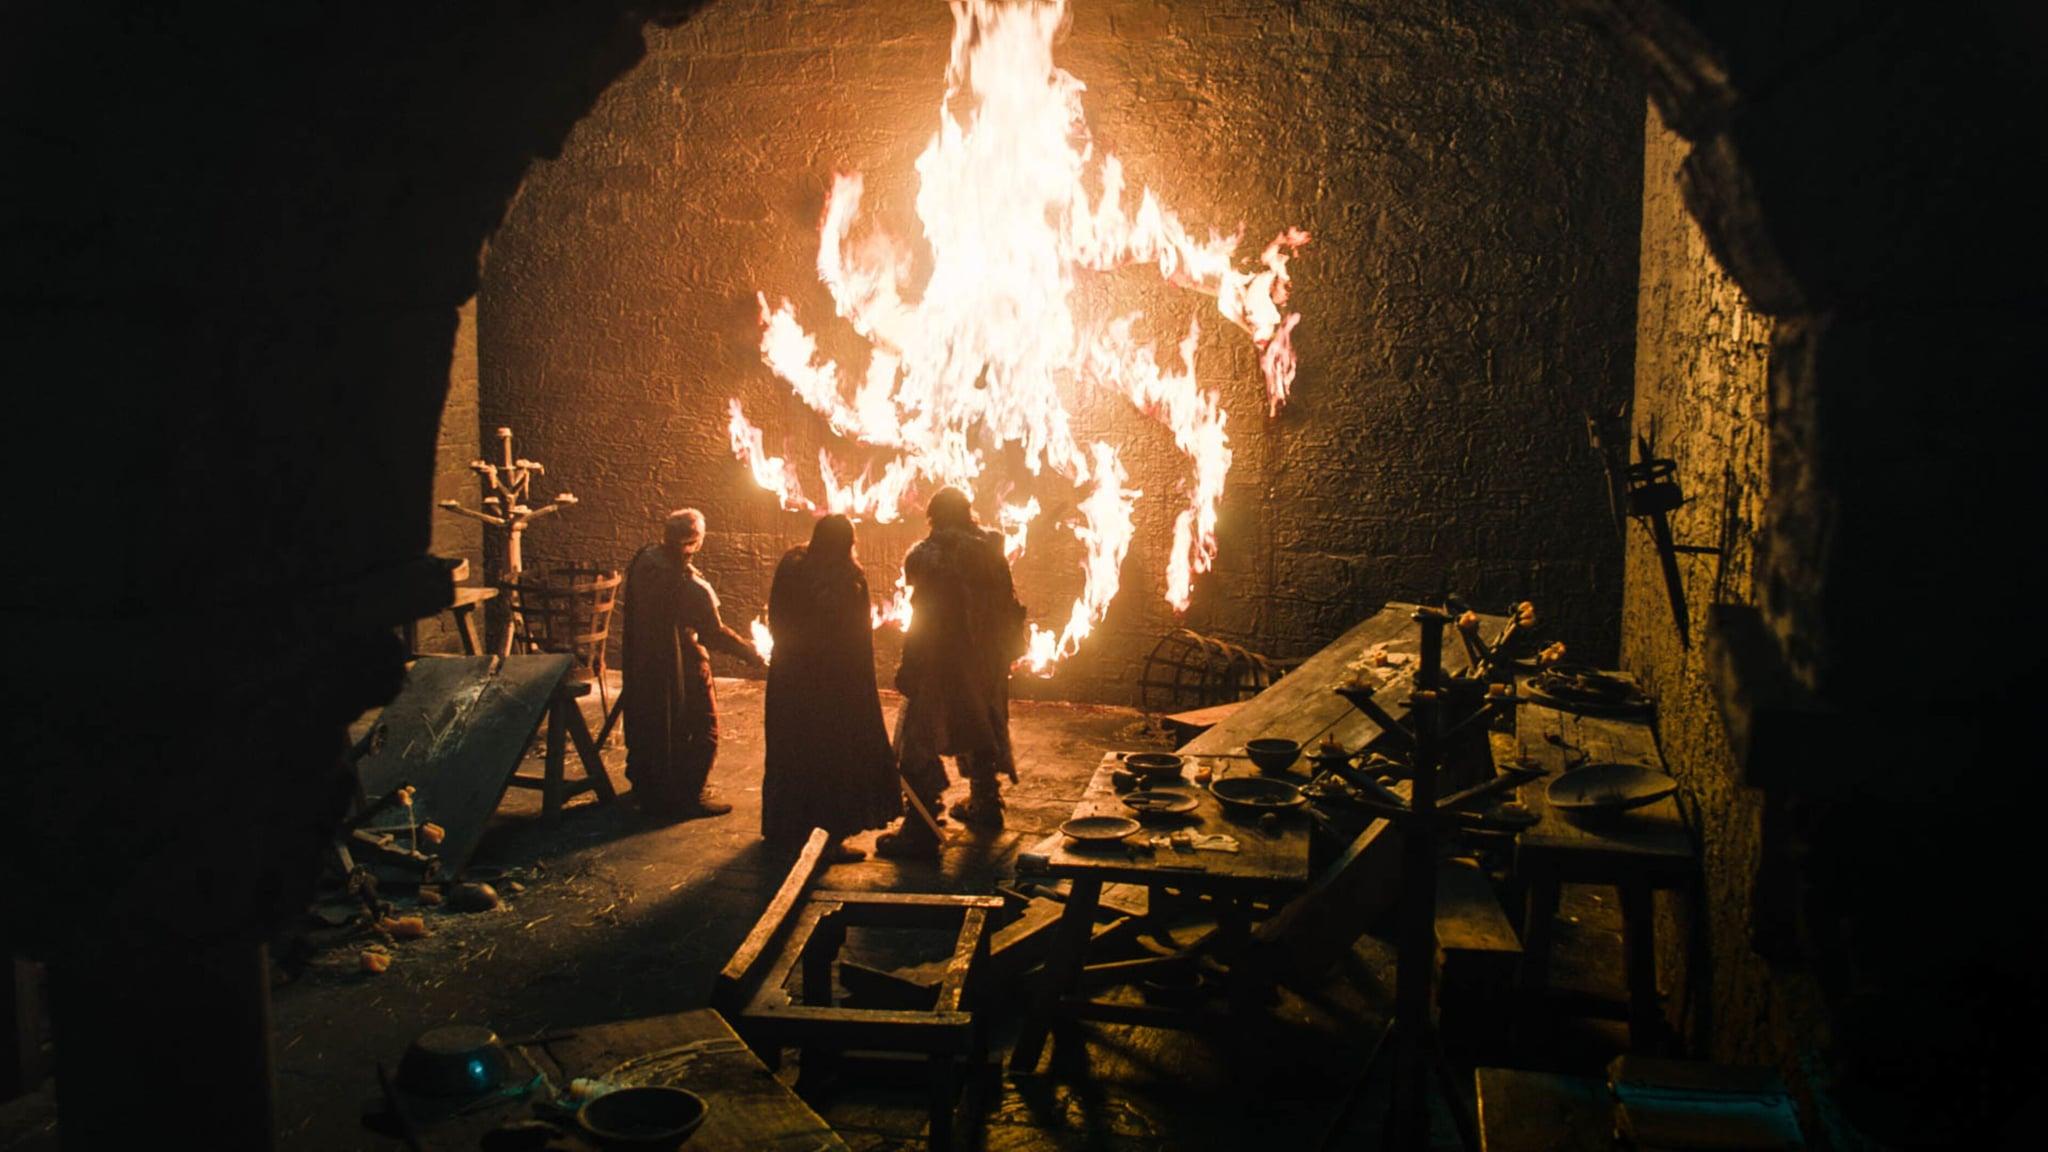 The game of thrones season 8 episode 1